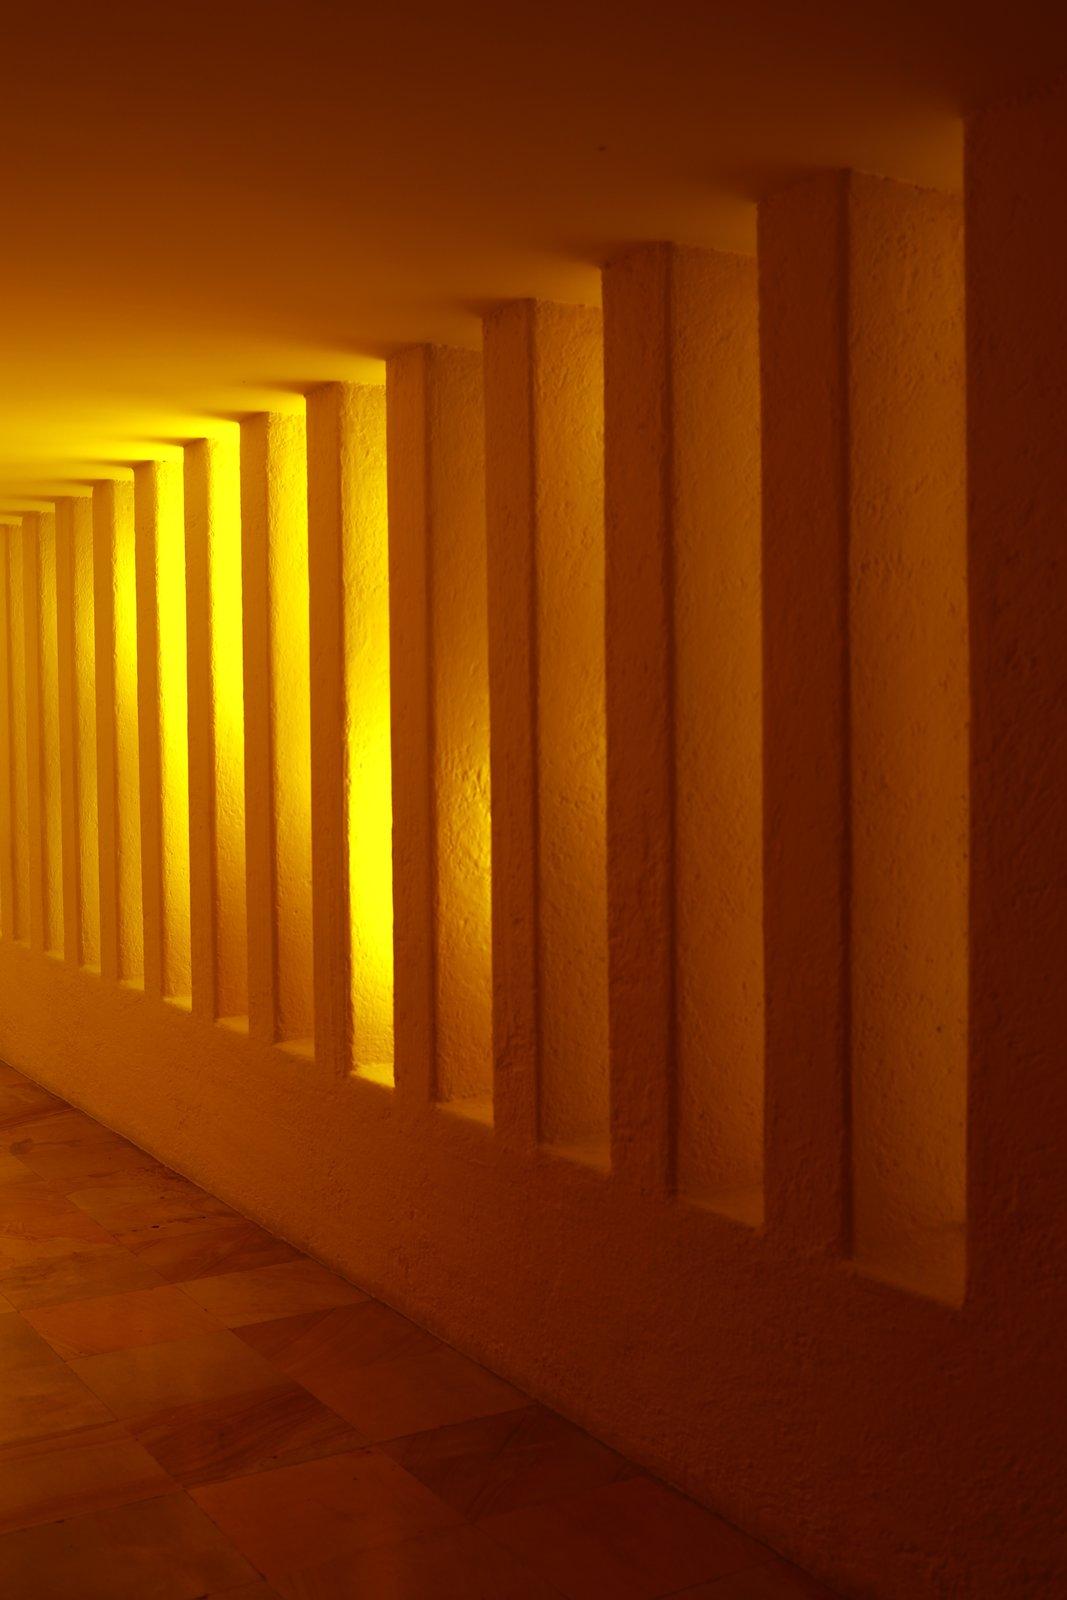 Casa Gilardi yellow hallway